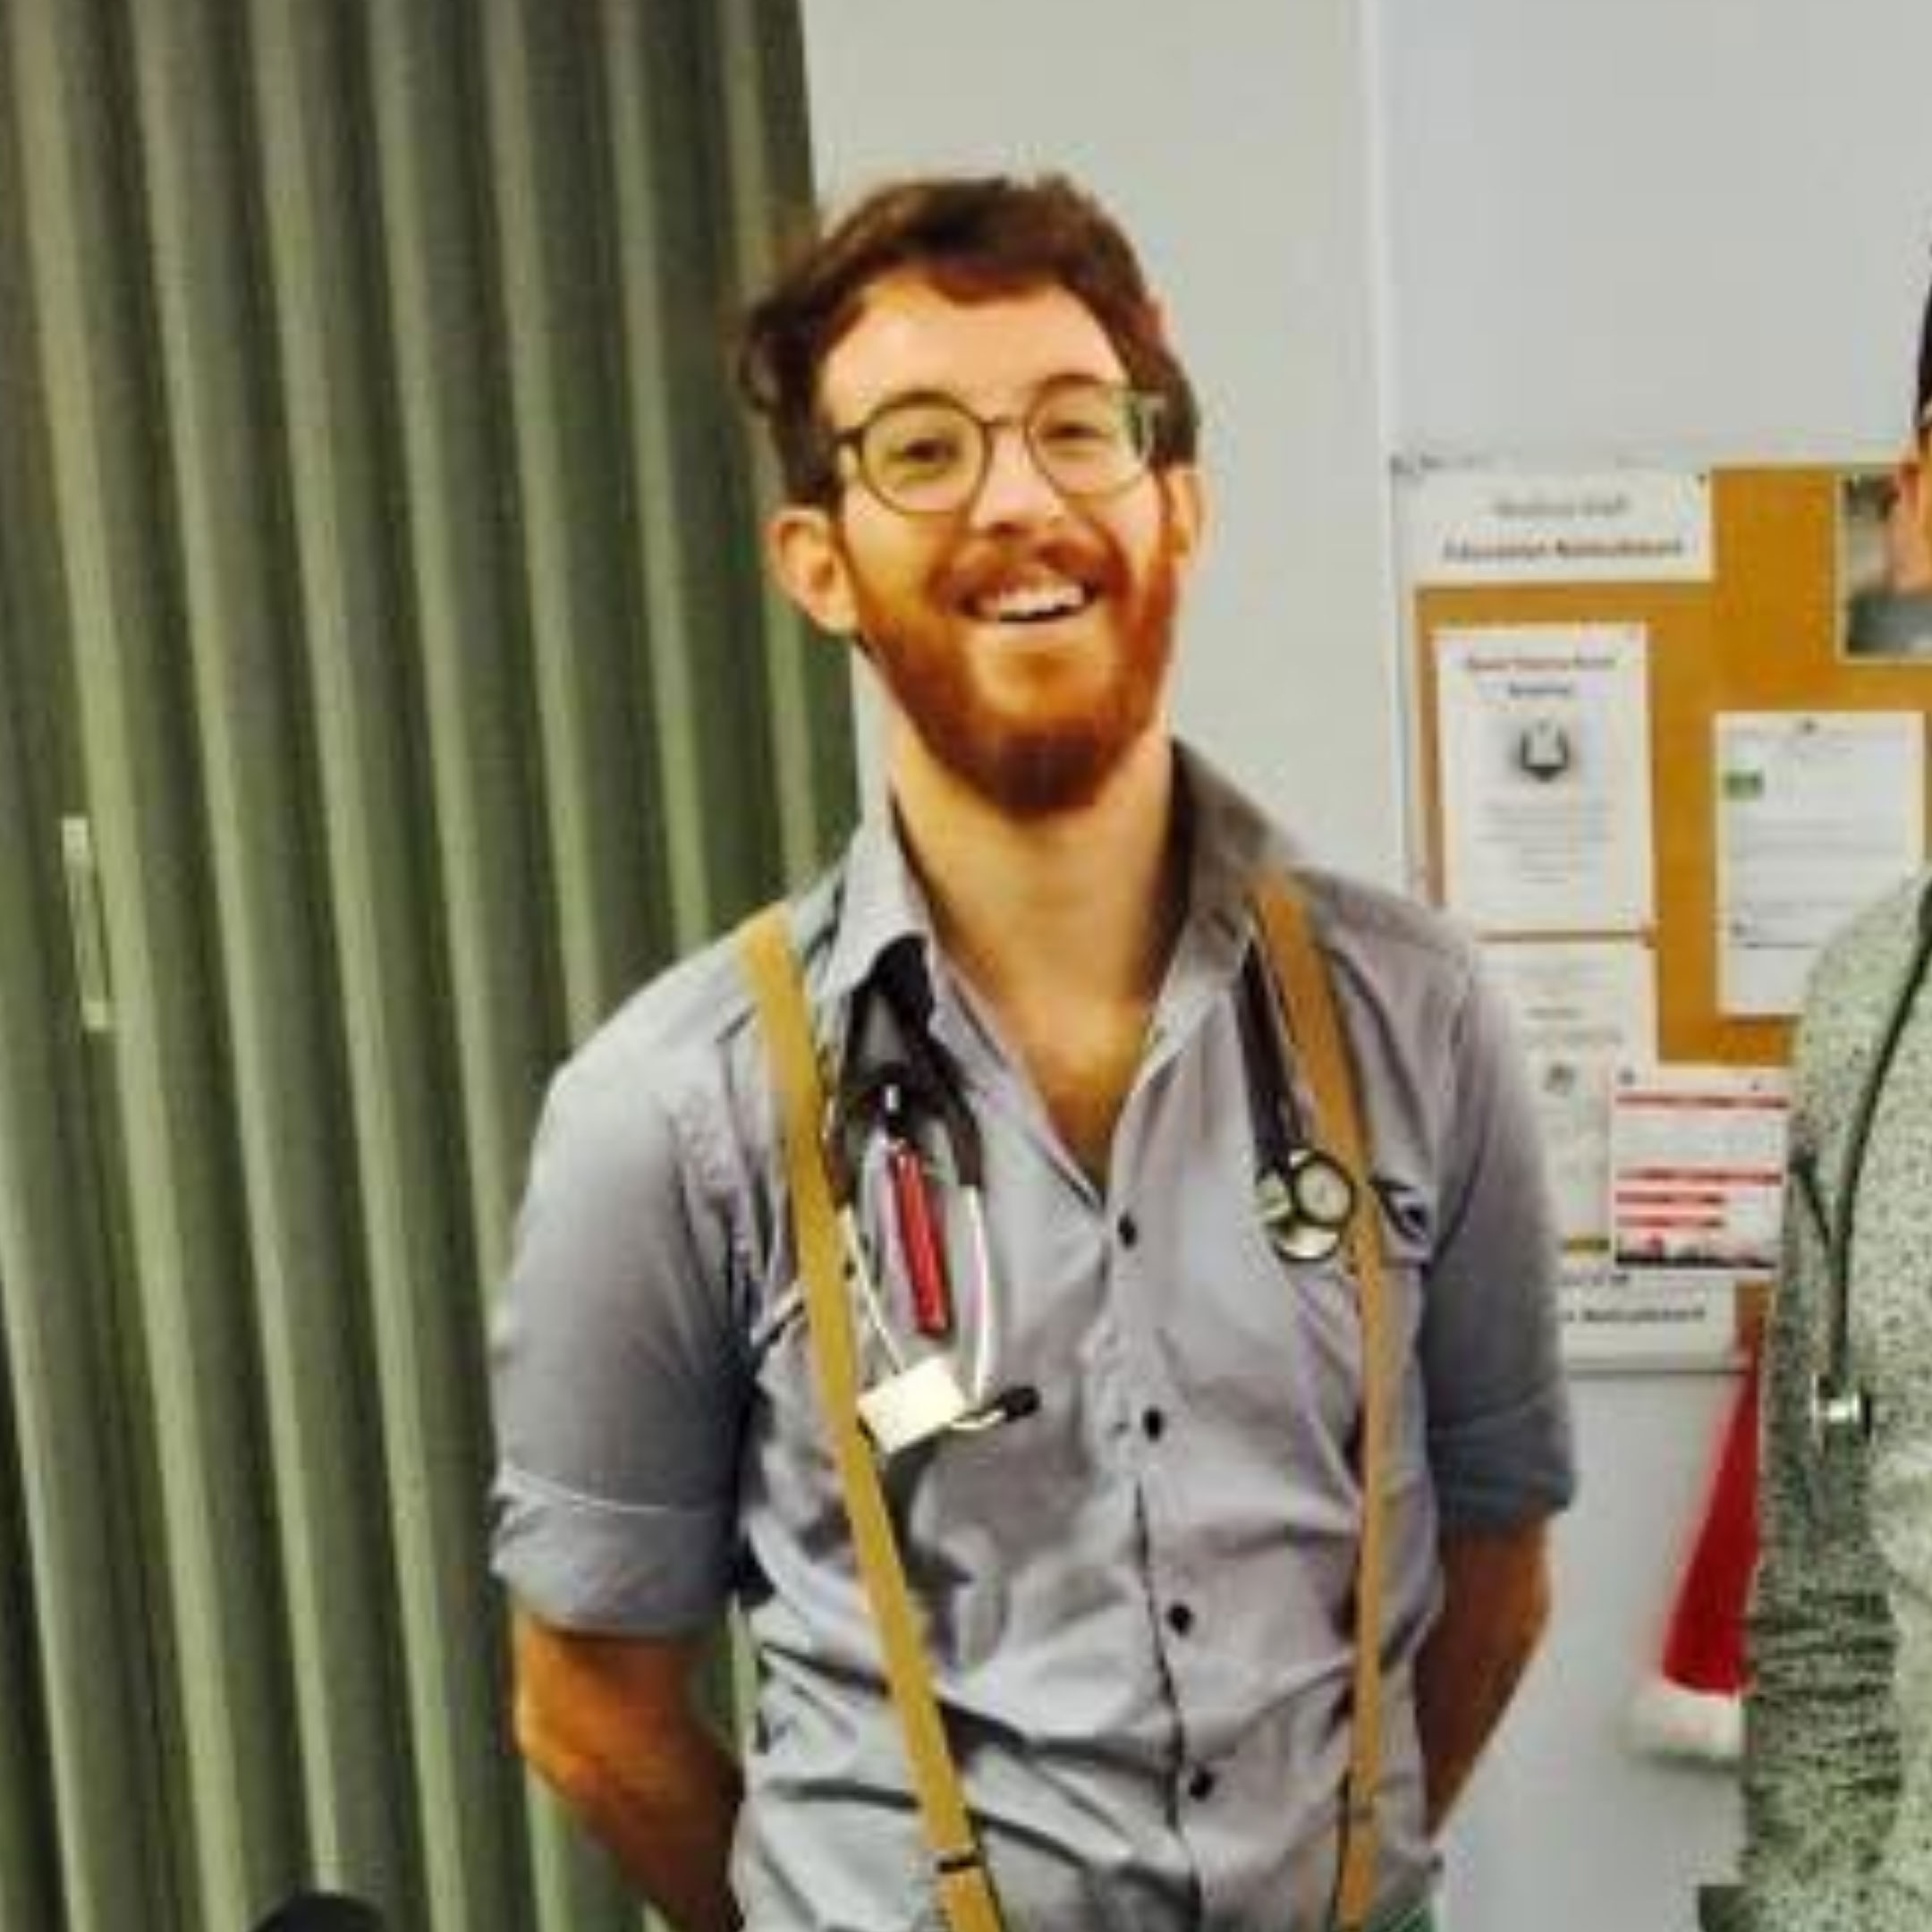 Cale Medicine Student